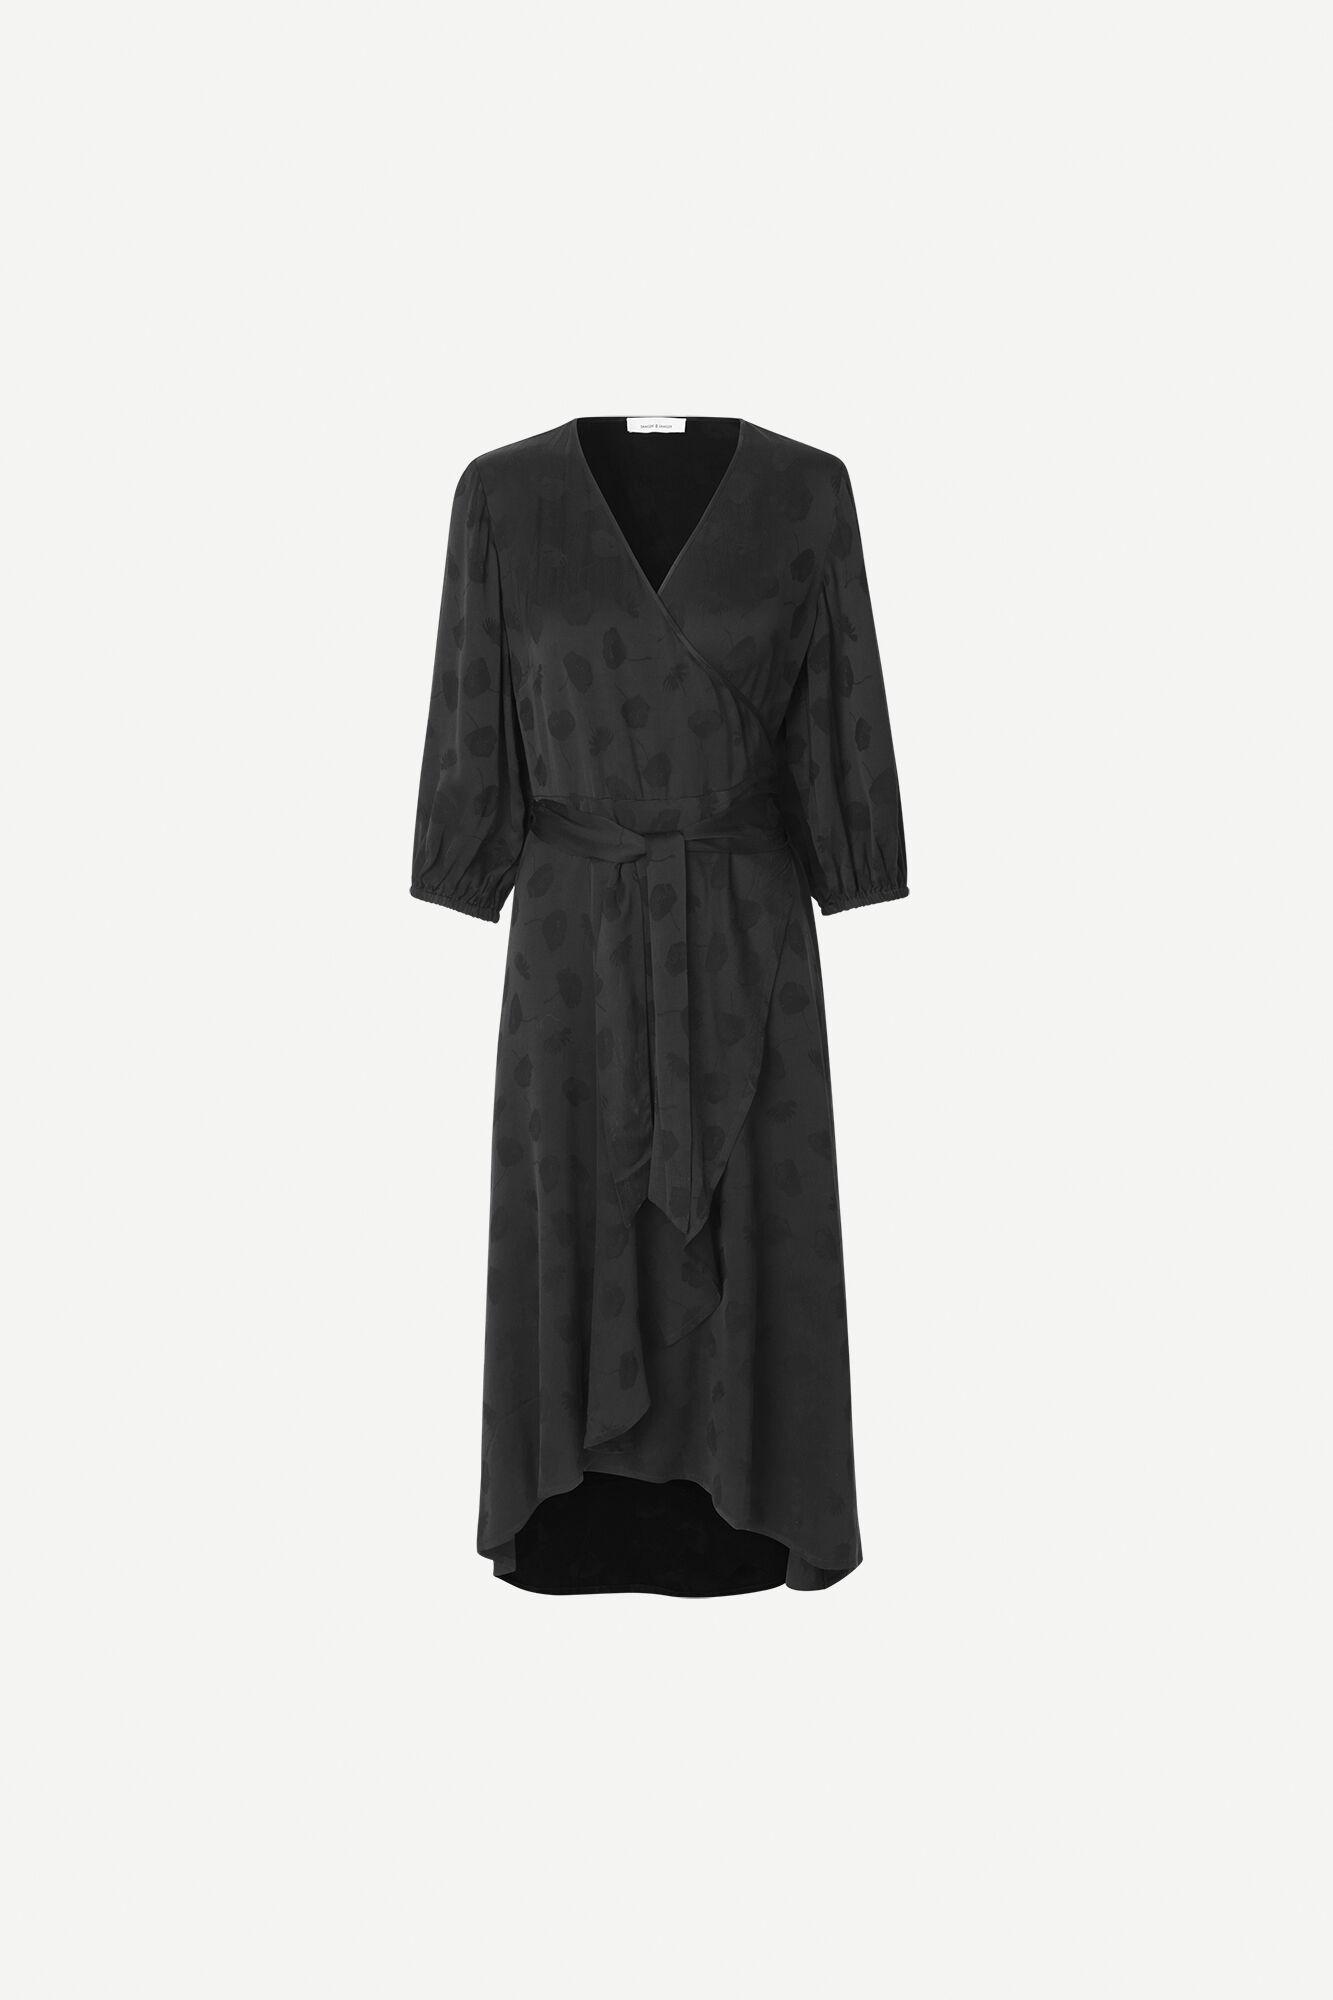 Veneta dress 11162